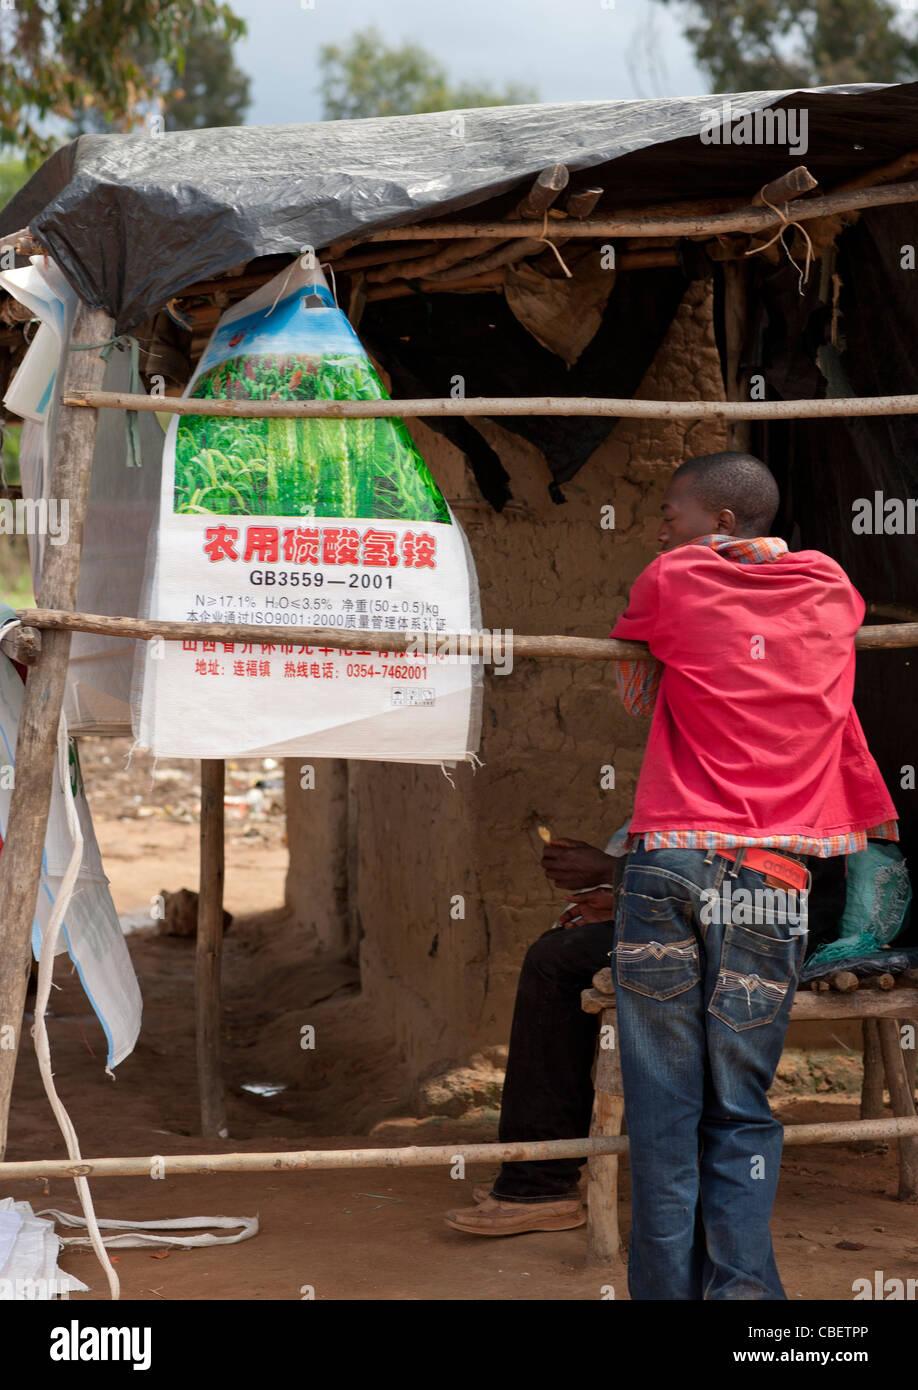 Chinese Advertisement In Lubango, Angola - Stock Image